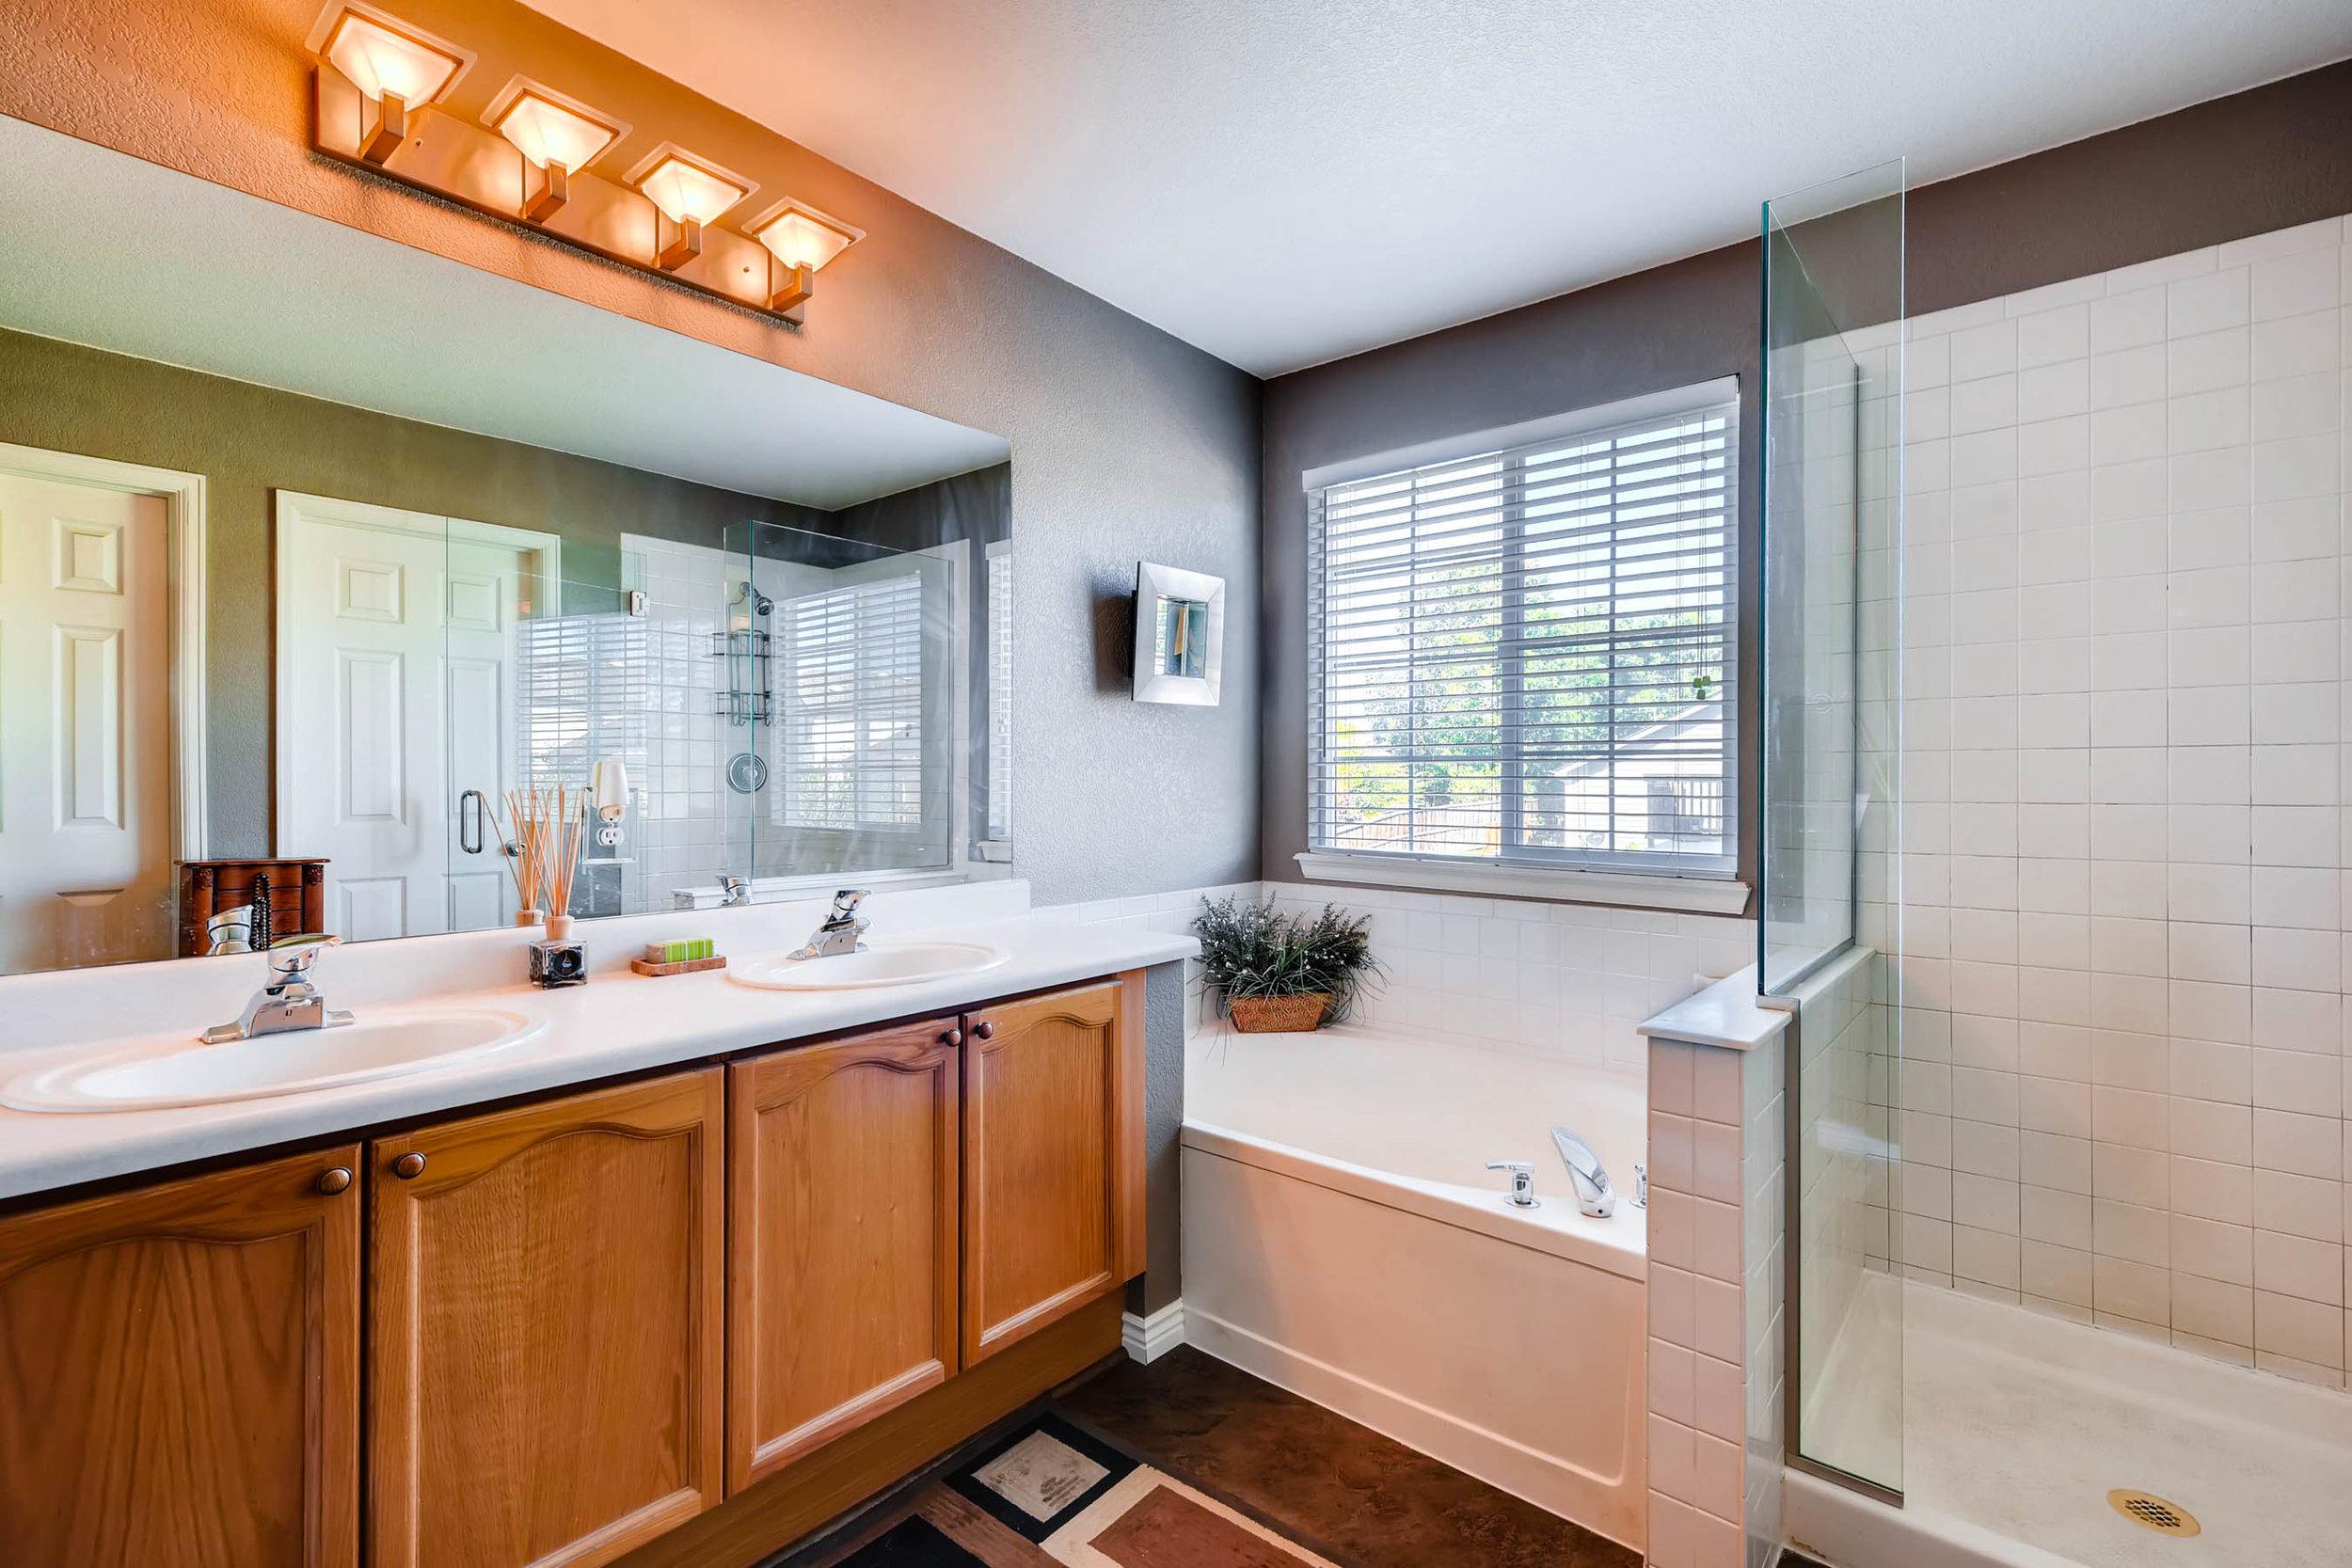 5863 South Gray St Littleton-print-019-14-2nd Floor Master Bathroom-2700x1800-300dpi.jpg